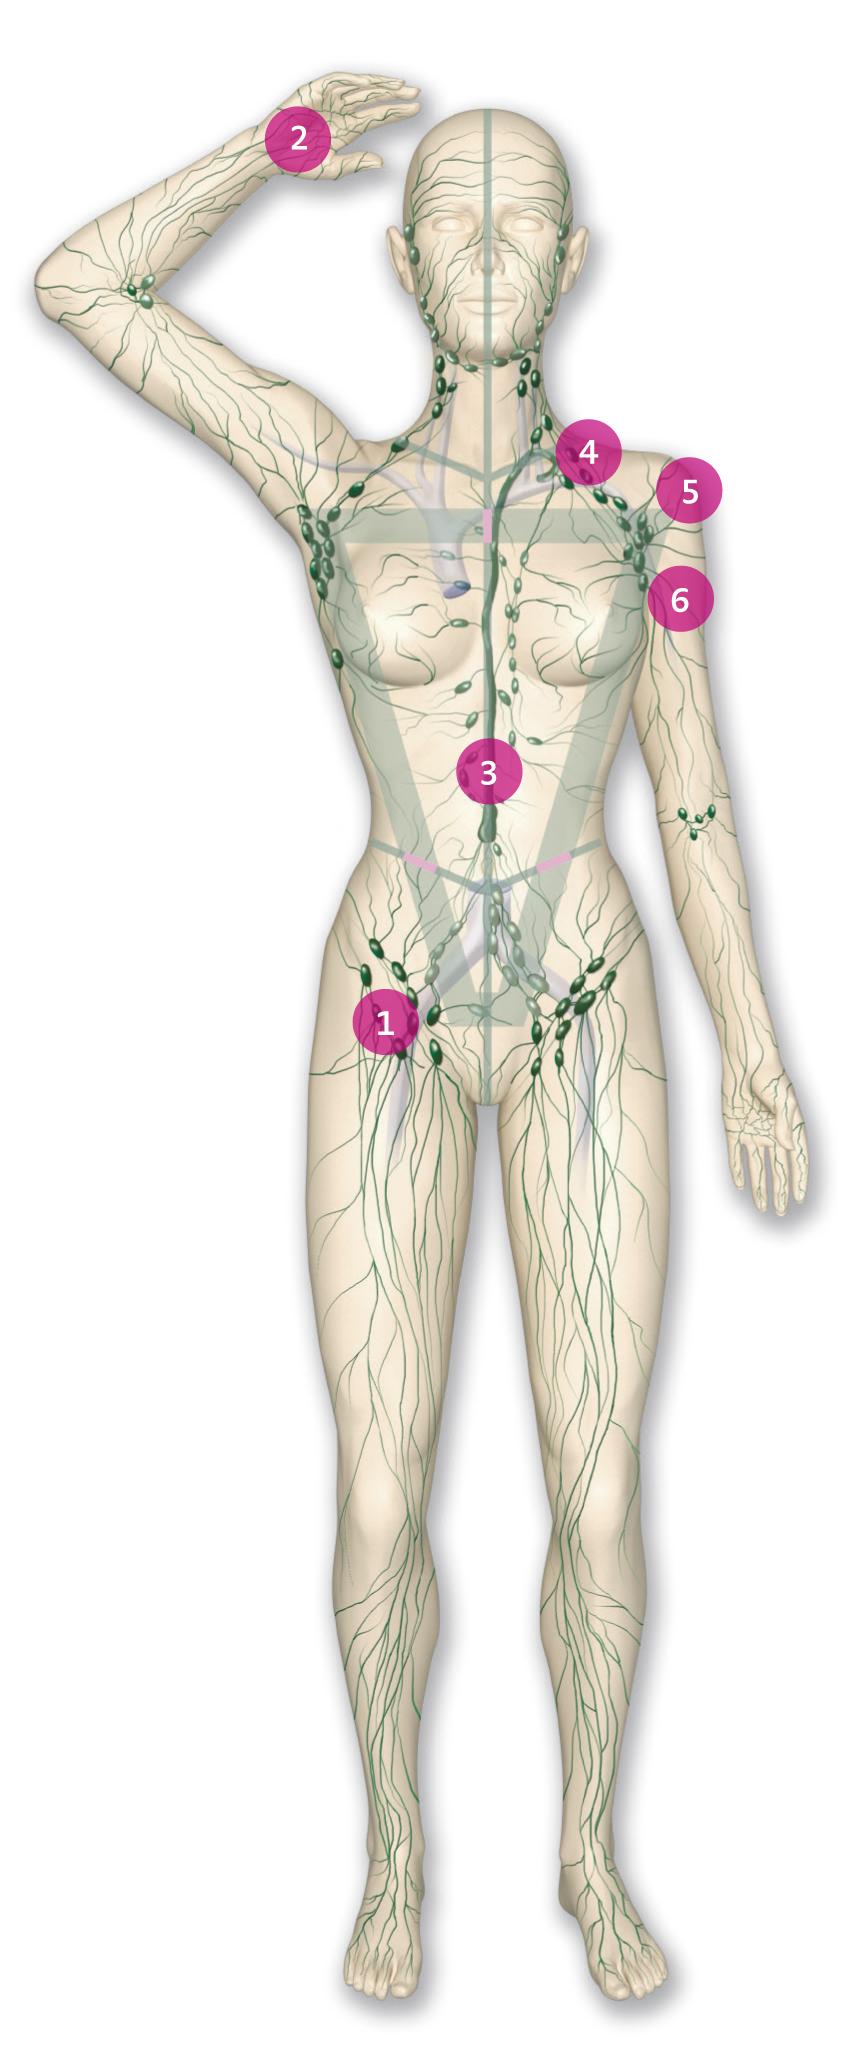 Das Lymphgefäßsystem - Lymphteam